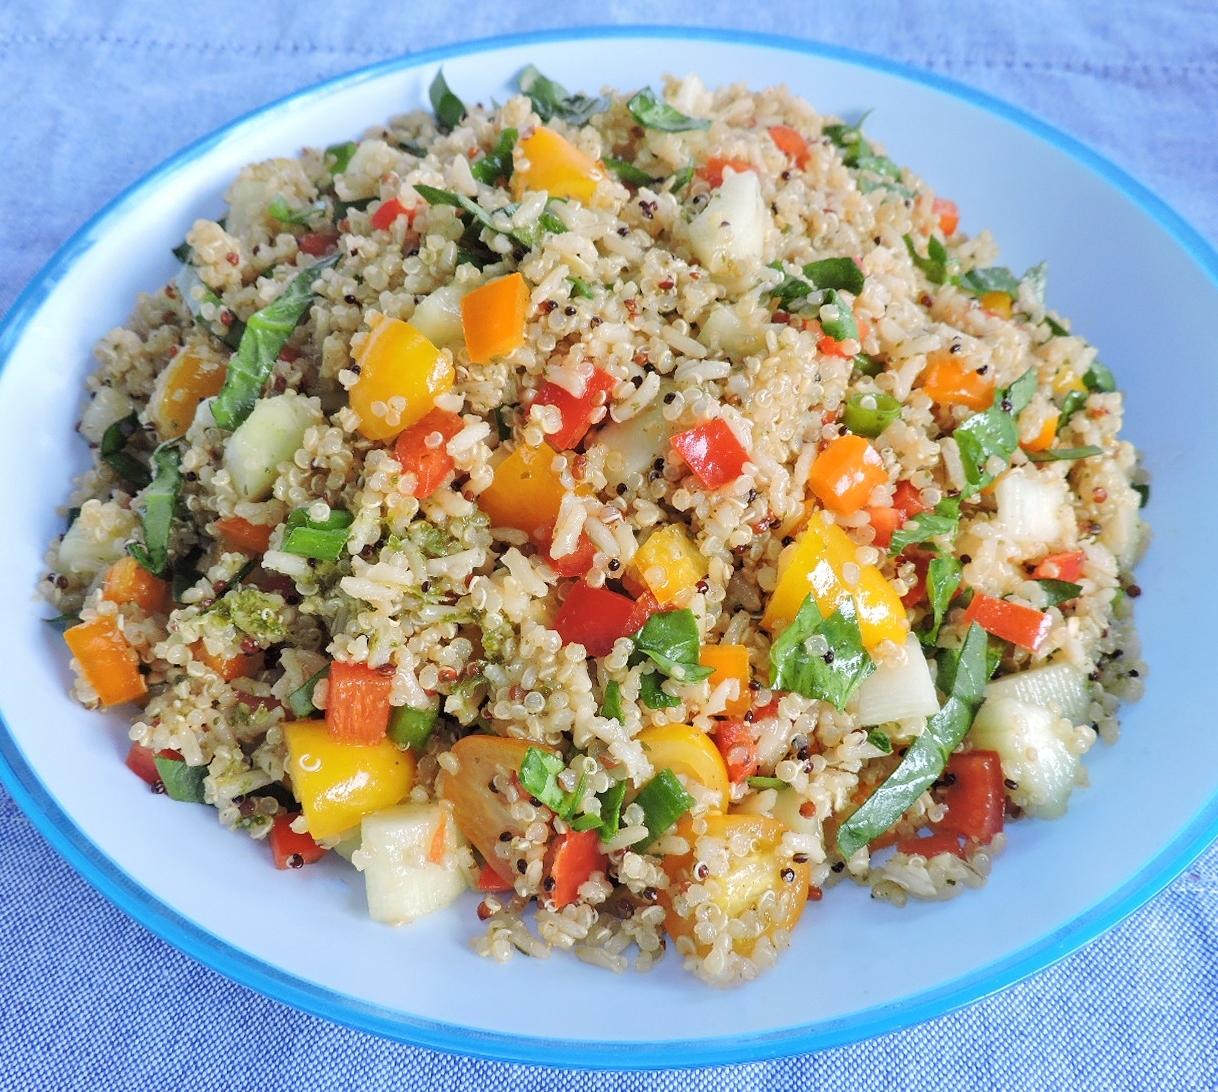 Colorful Quinoa Brown Rice Salad